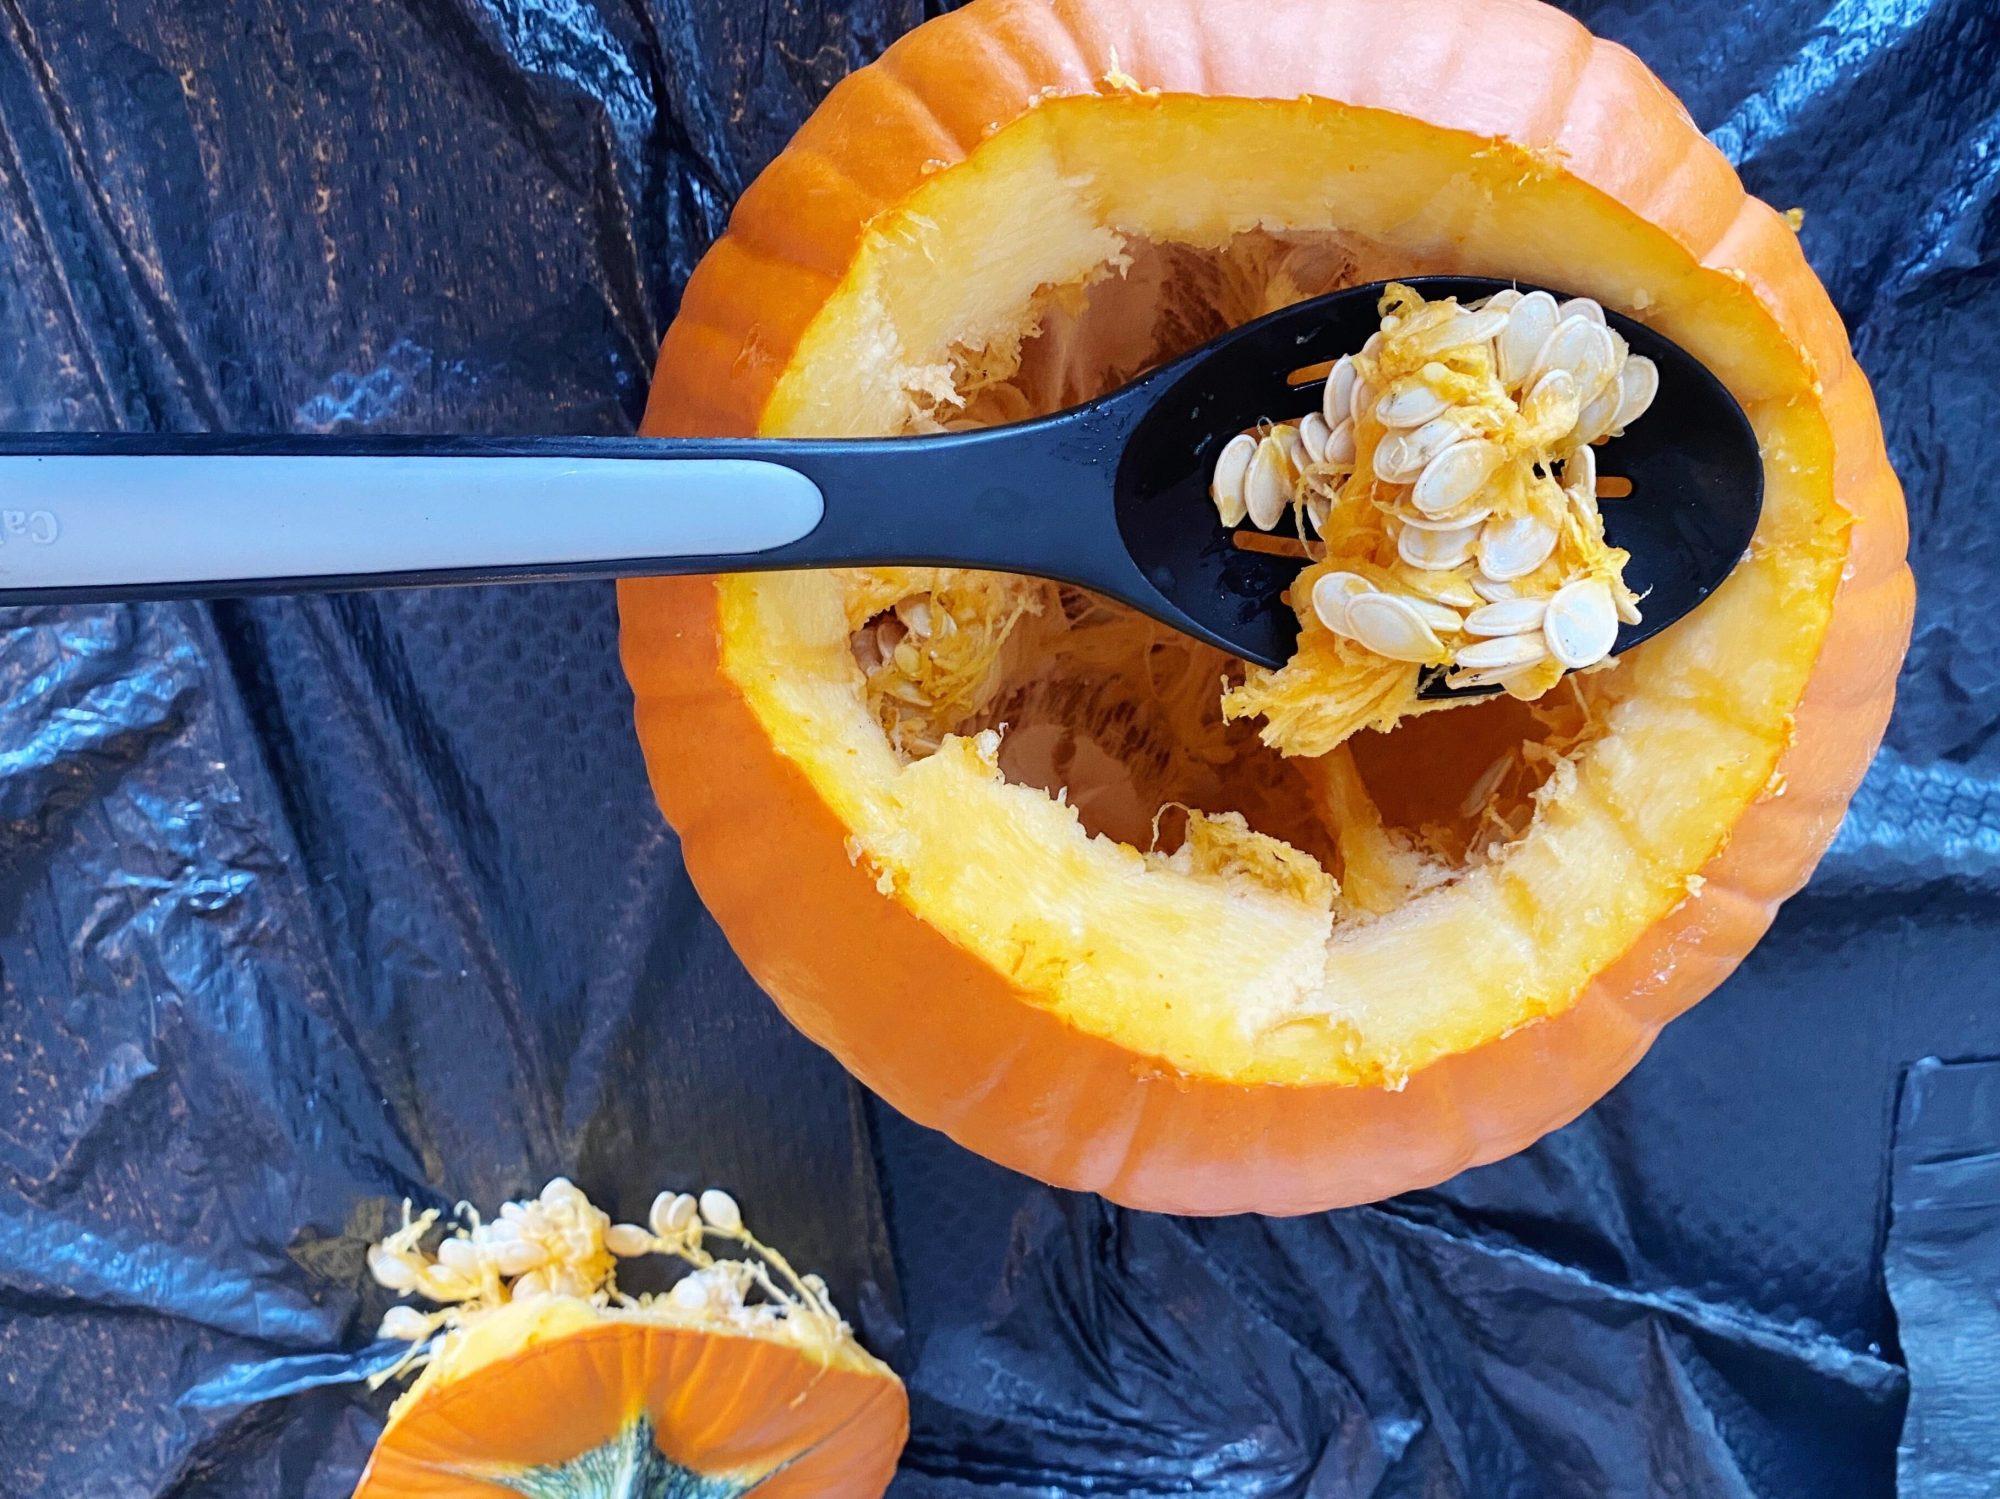 Scooping pumpkin seeds